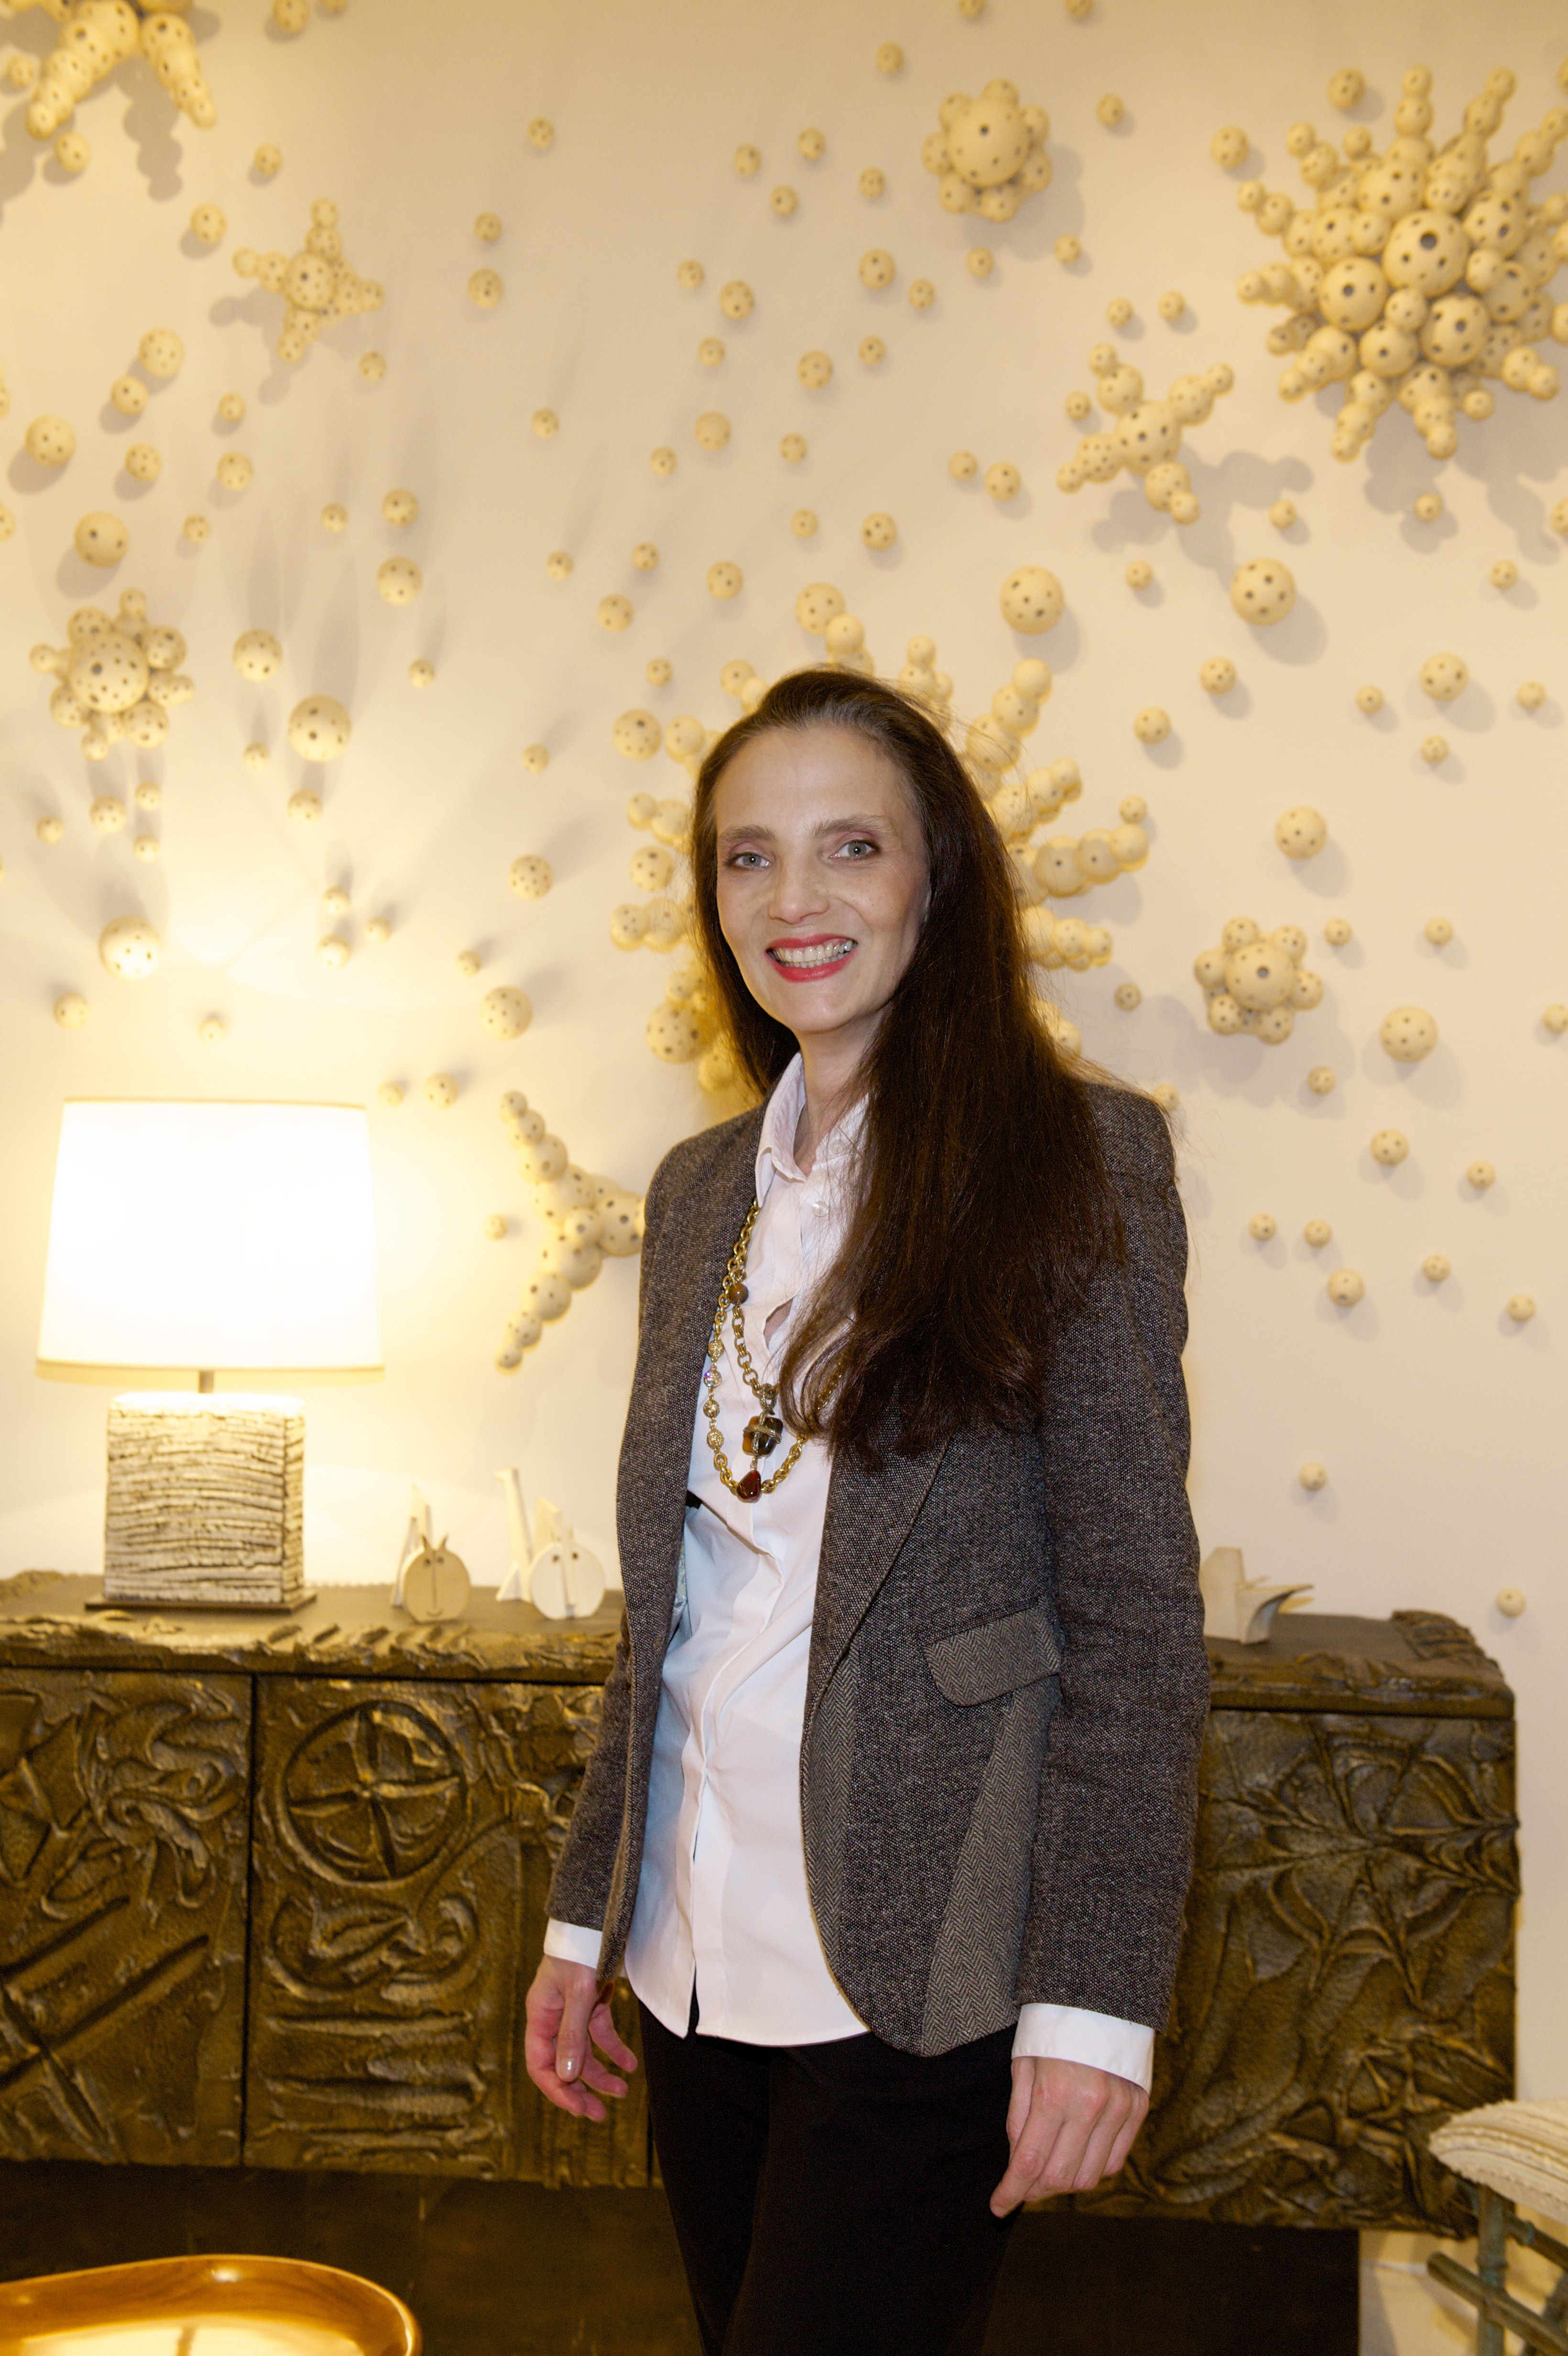 13f19f0c702 Madame Alexandra Di Andia présente au salon Art&Design PAD Paris ...